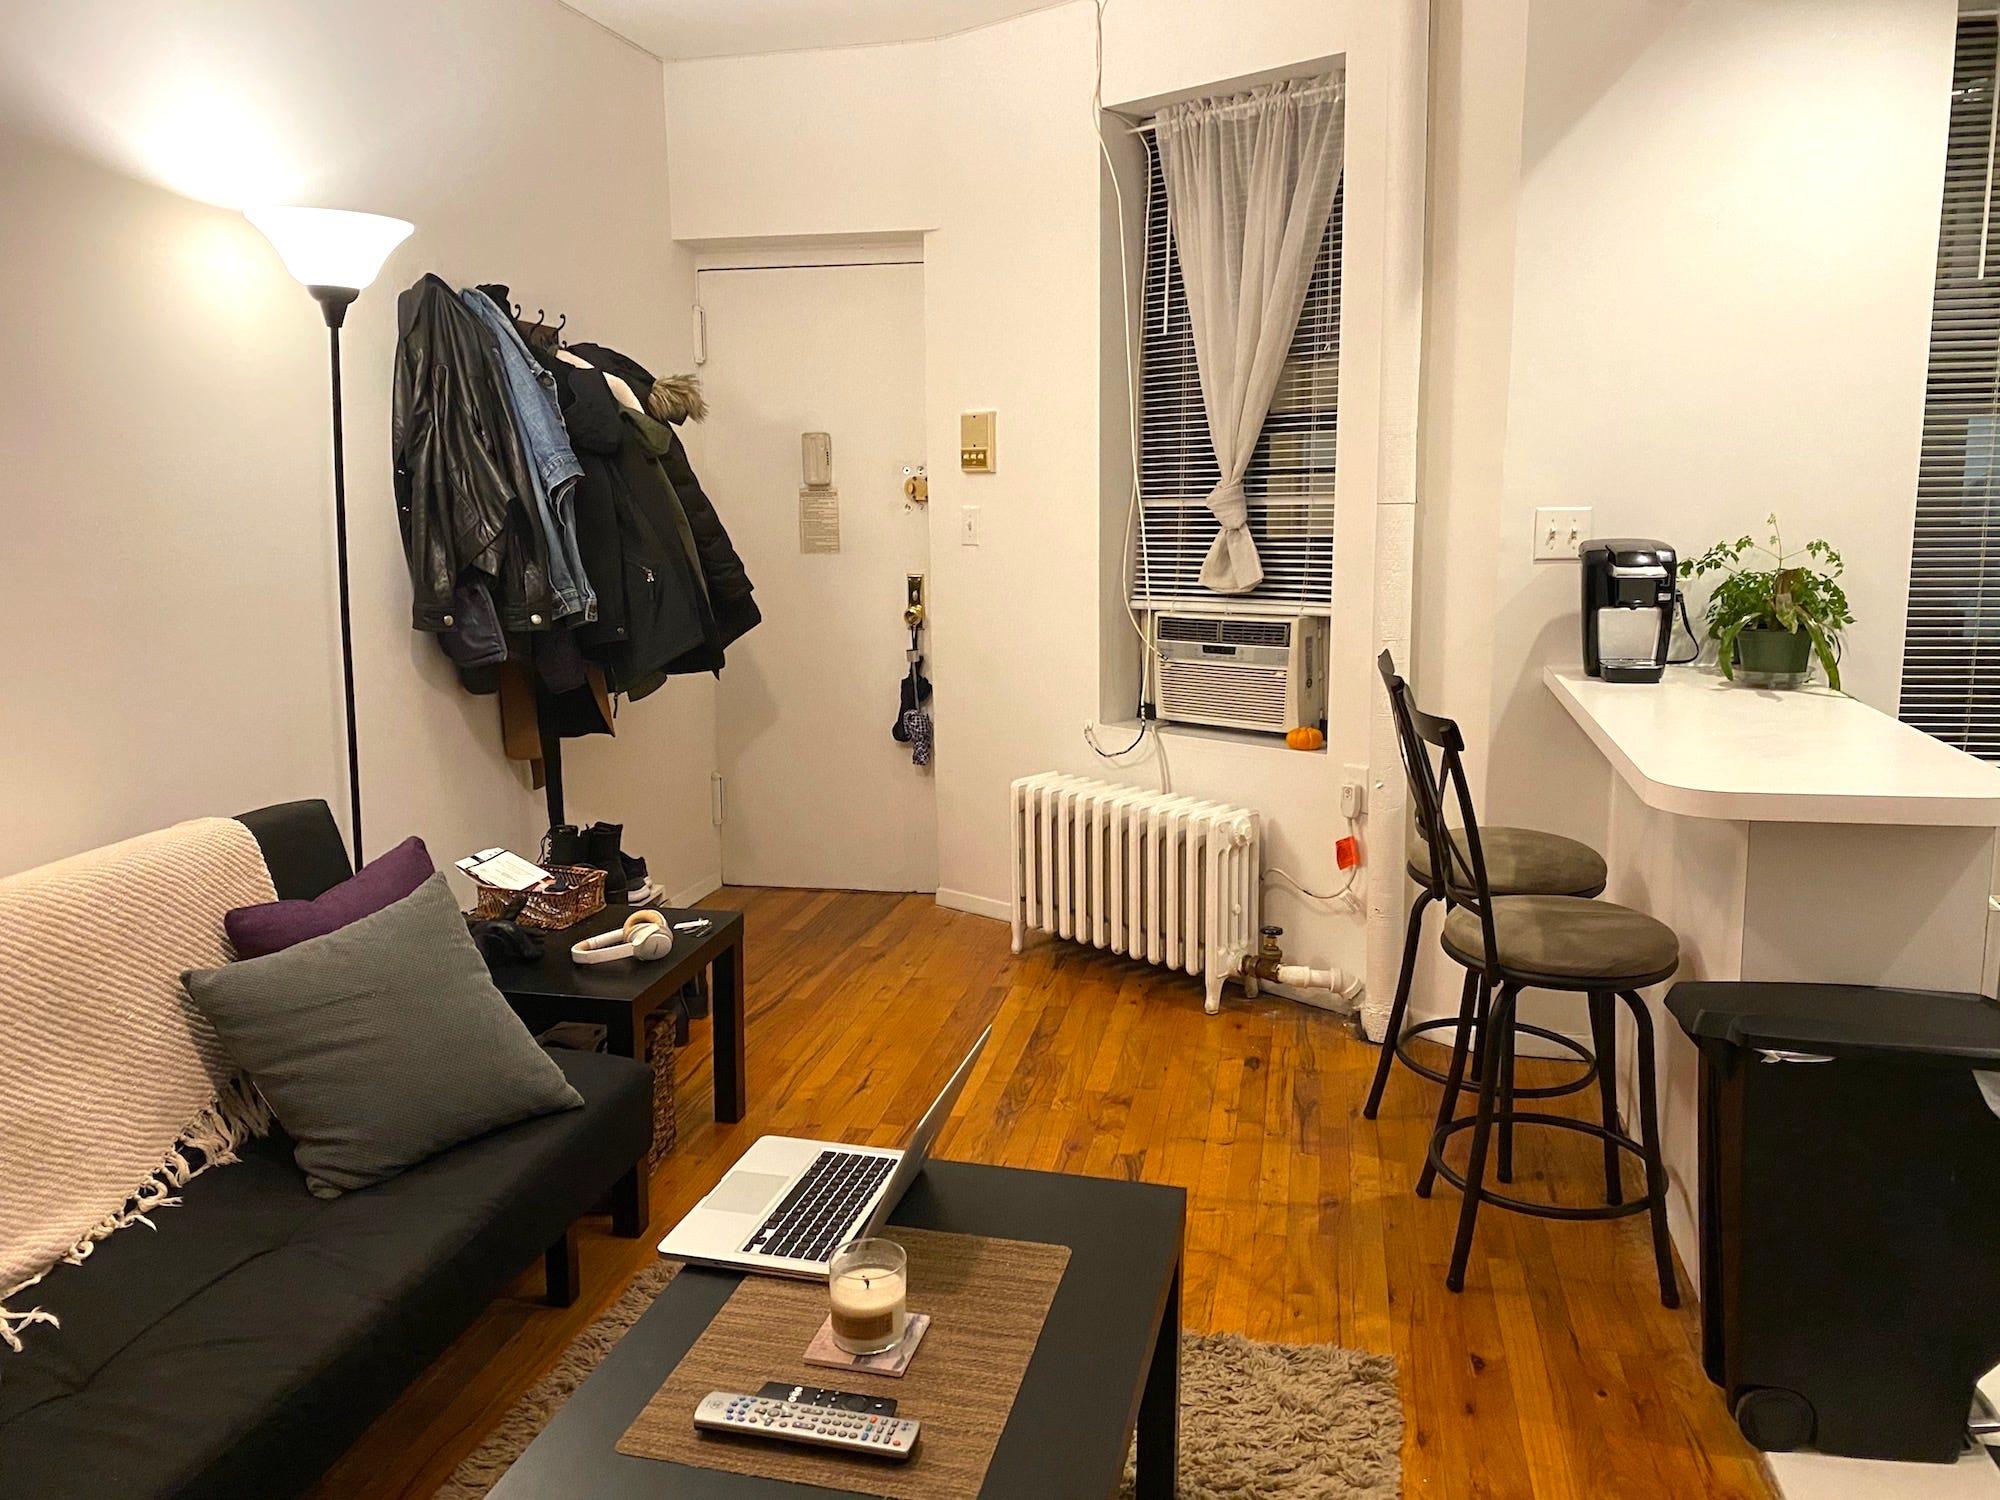 Tiny Houses Vs New York City Apartments Photo Comparison